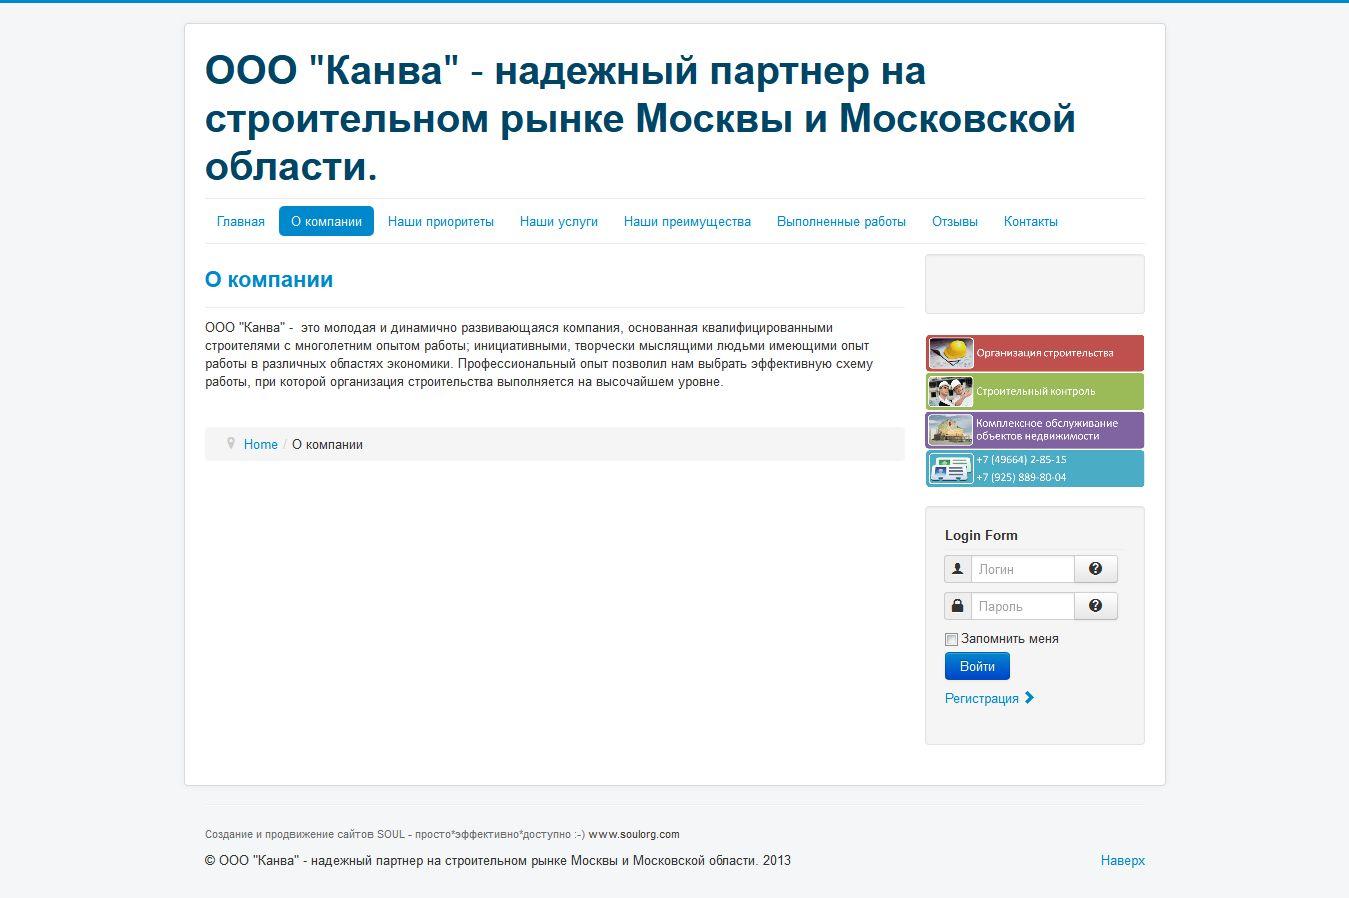 Сайт-визитка на Joomla 3.0.   Обслуживание объектов недвижимости.